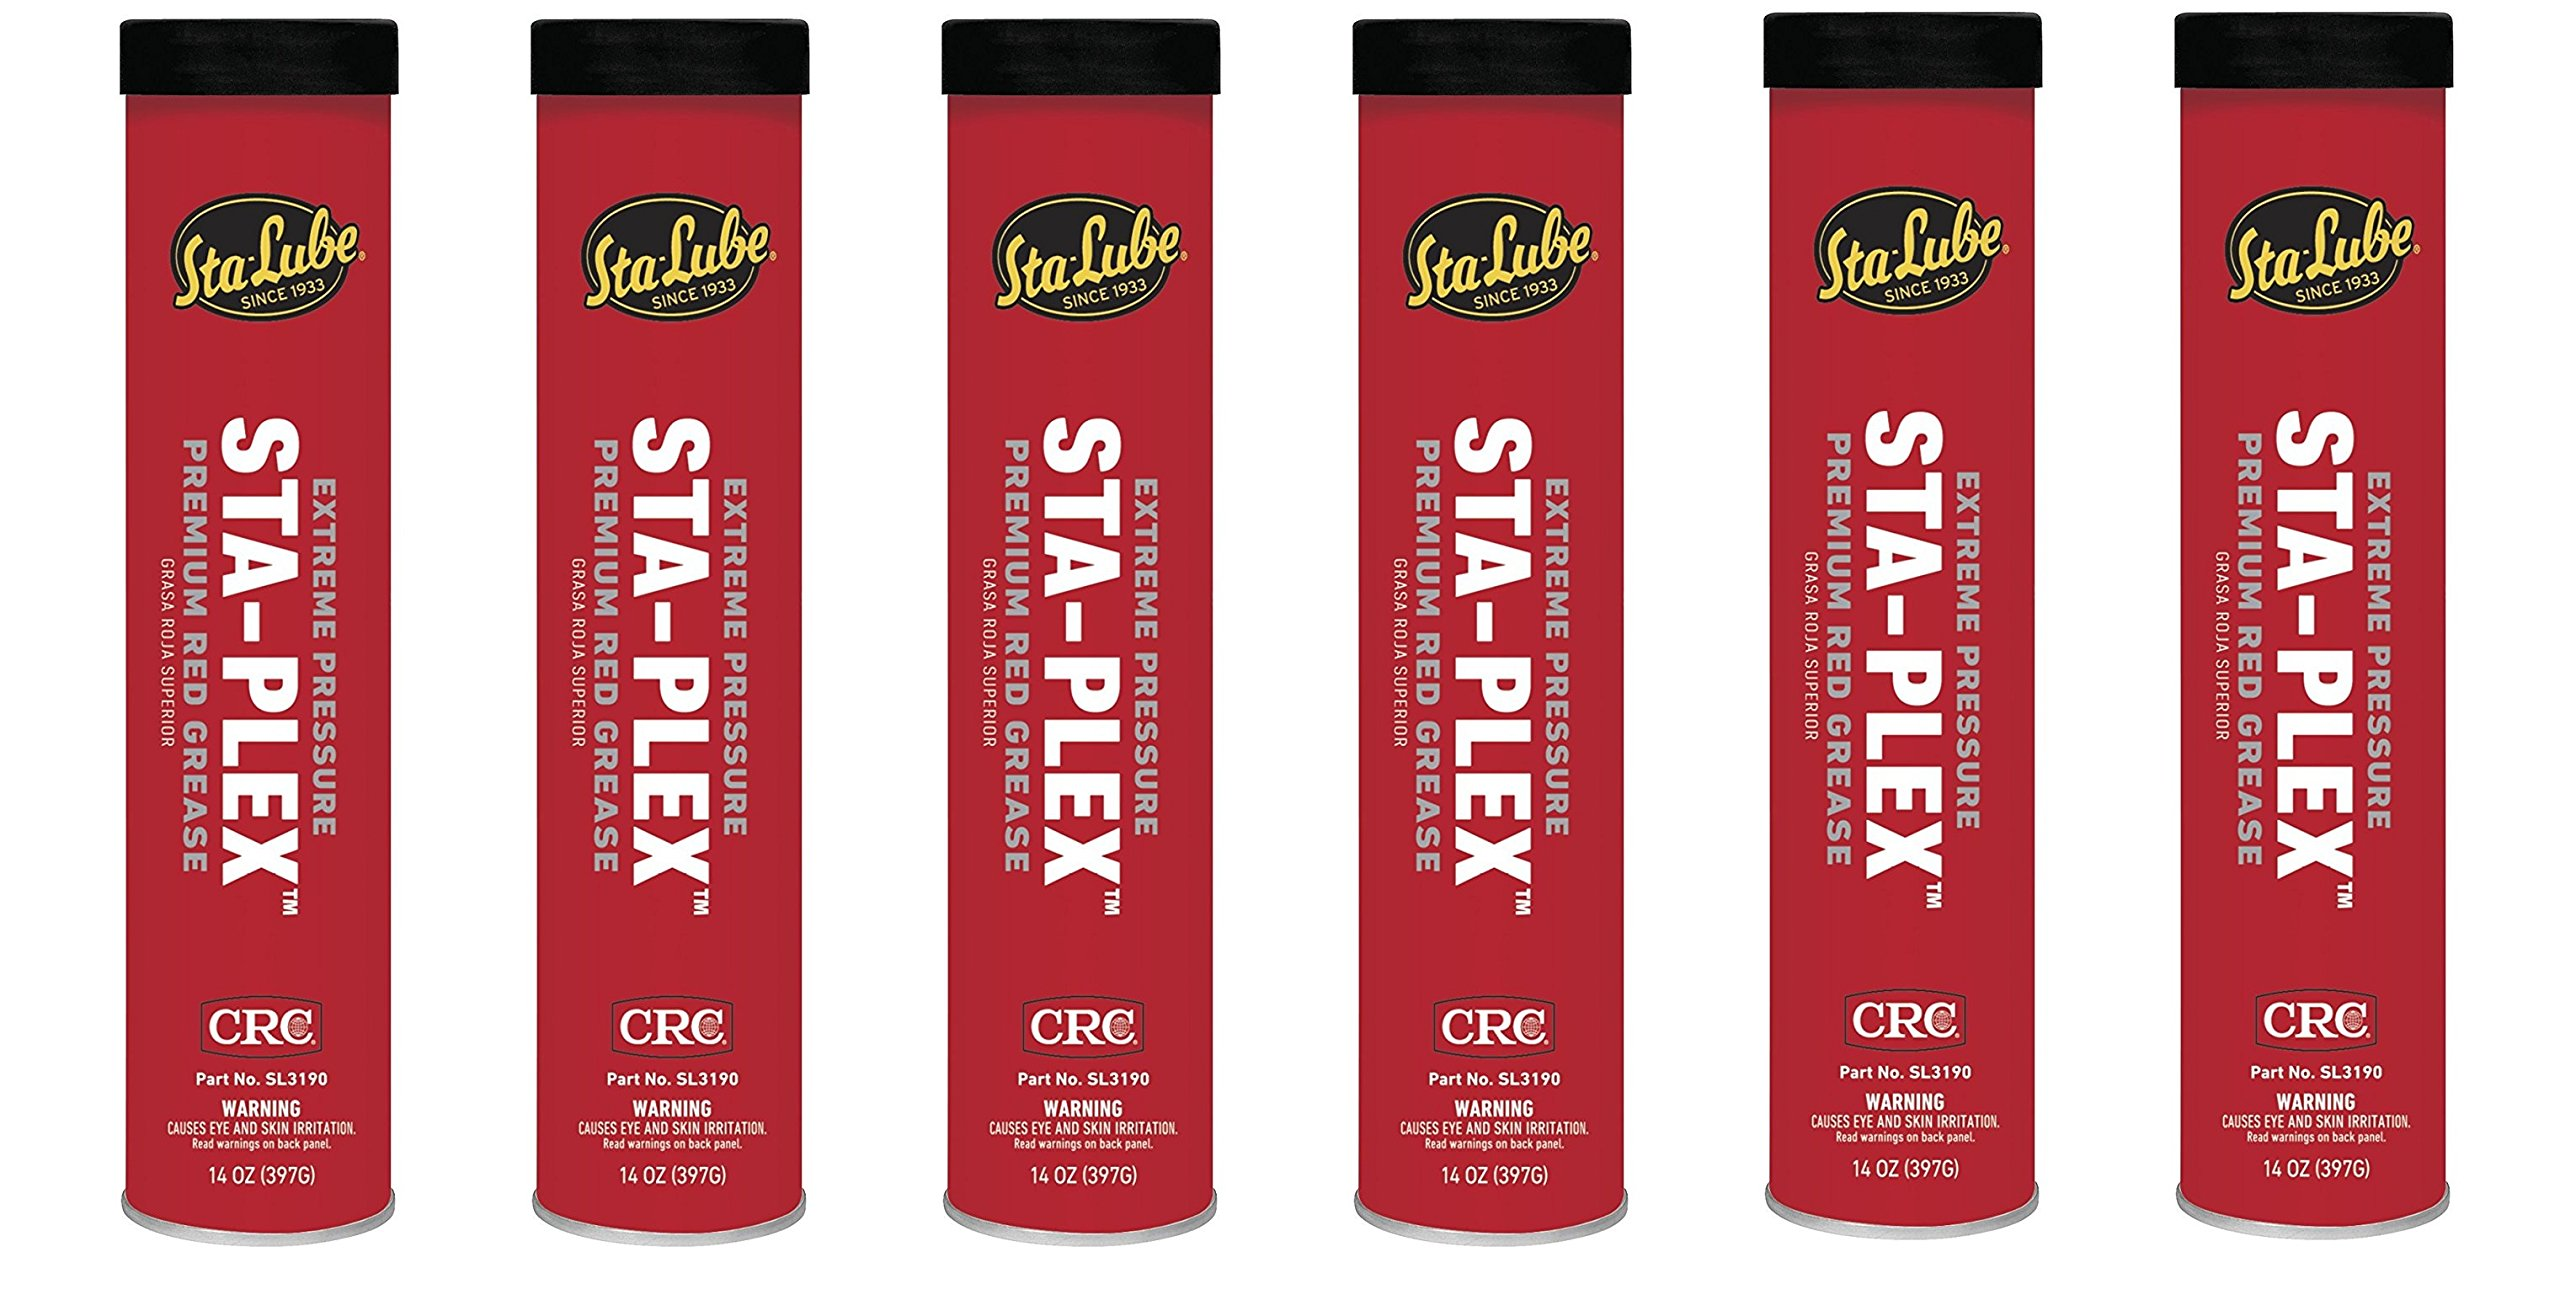 CRC SL3190 Sta-Plex Extreme Pressure Premium Red Grease, 14oz Cartridge (6)